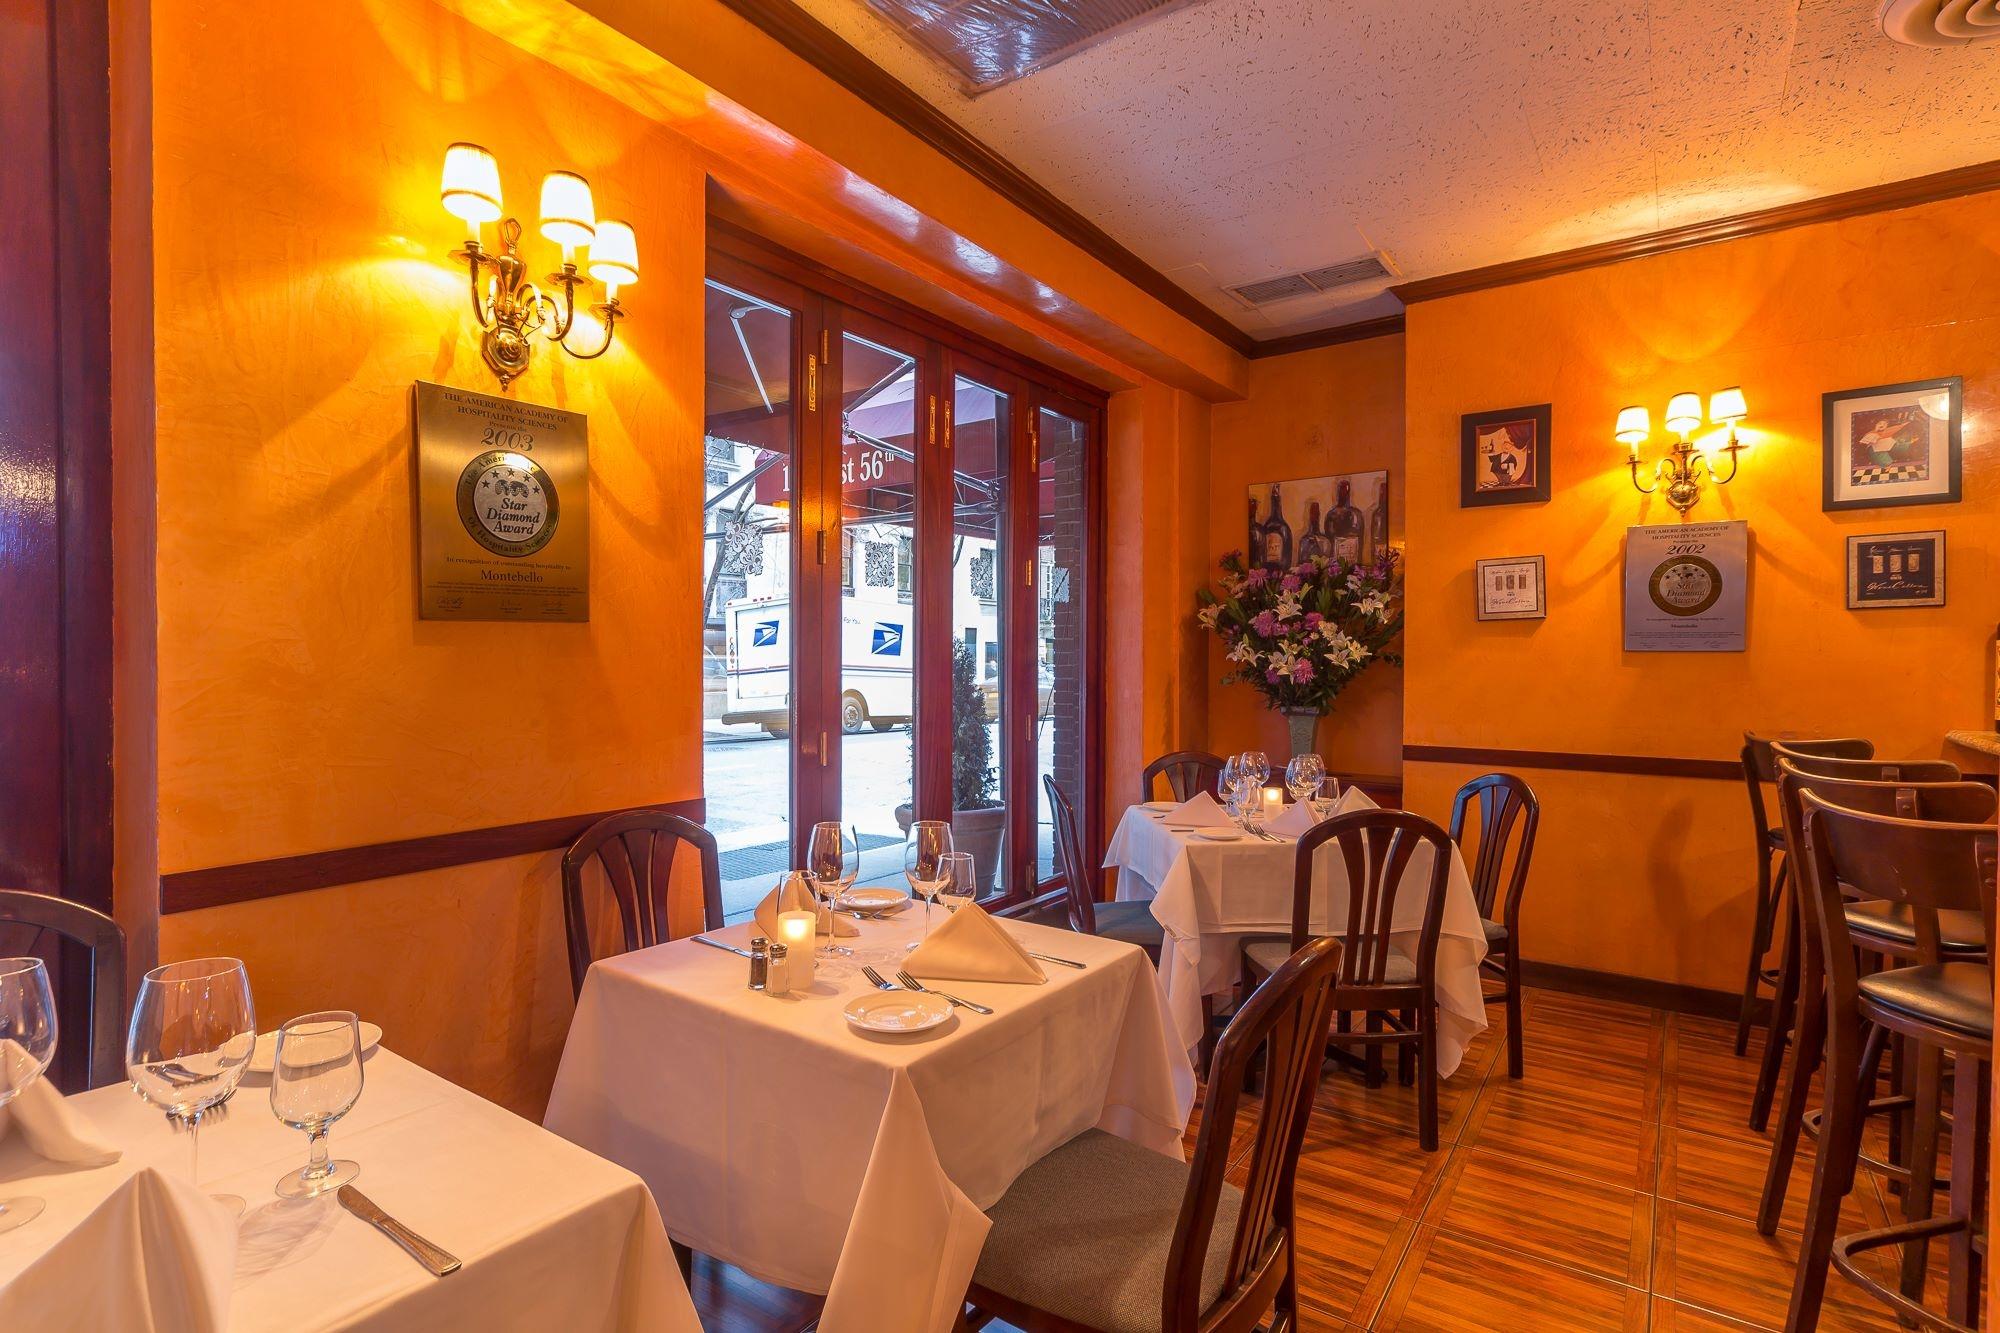 Italian Foods Near Me: Montebello, New York New York (NY)